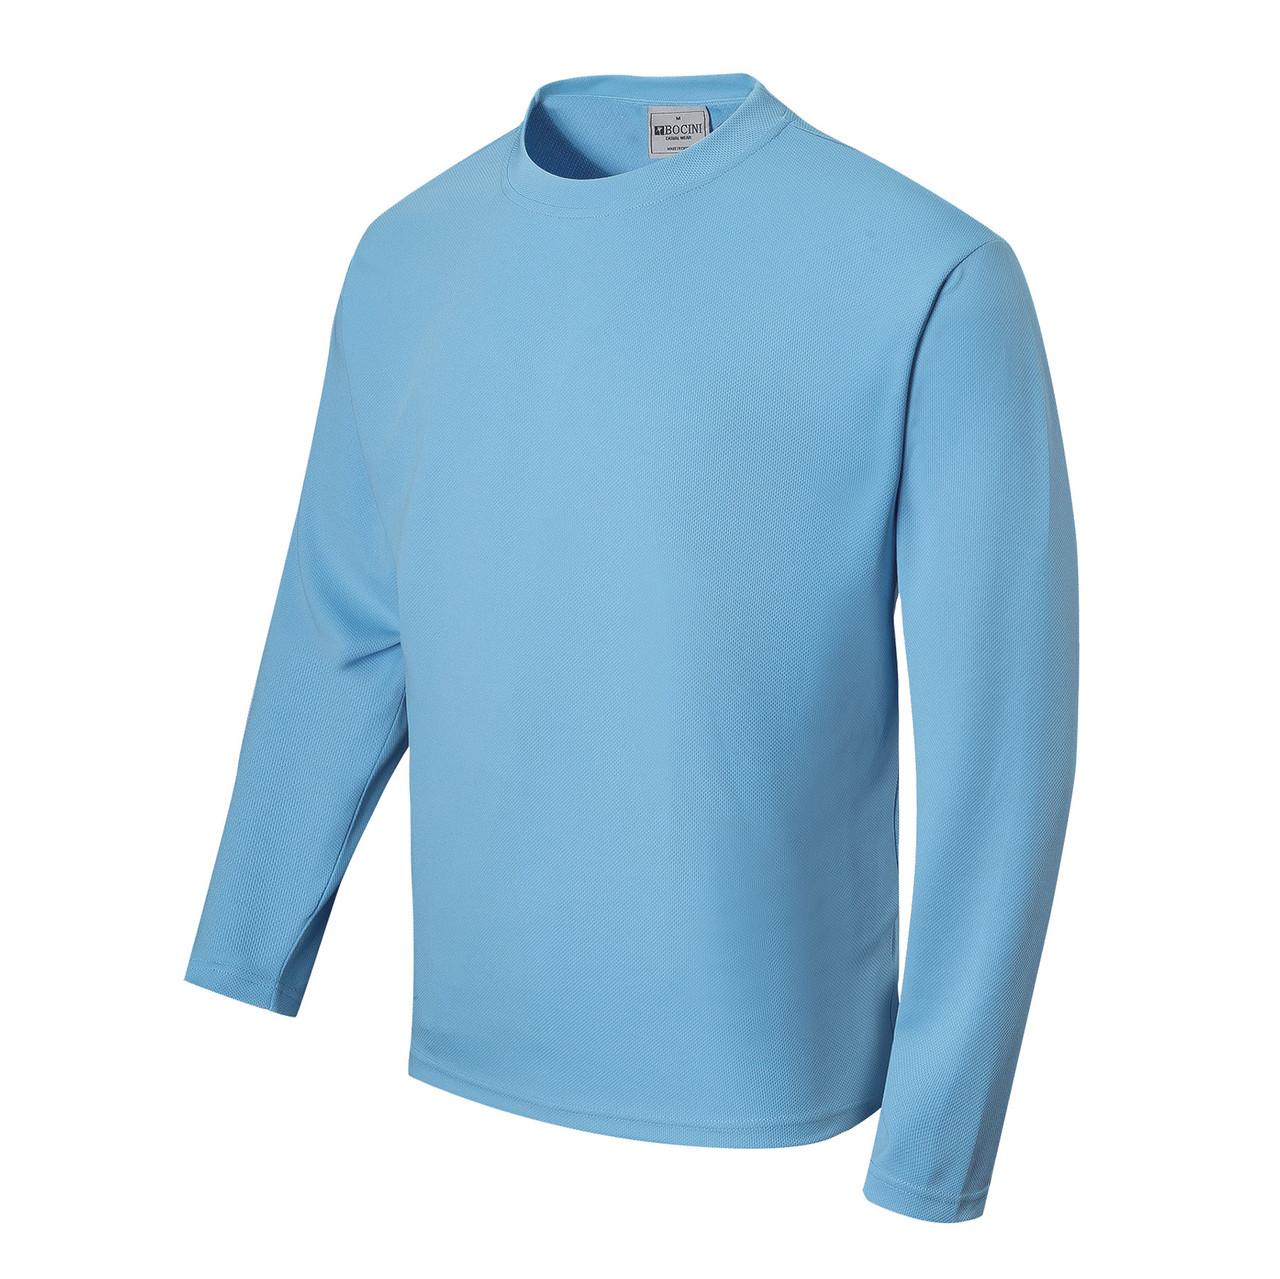 Long Sleeve Shirt Two Camel Thank A Librarian Tee Shirt